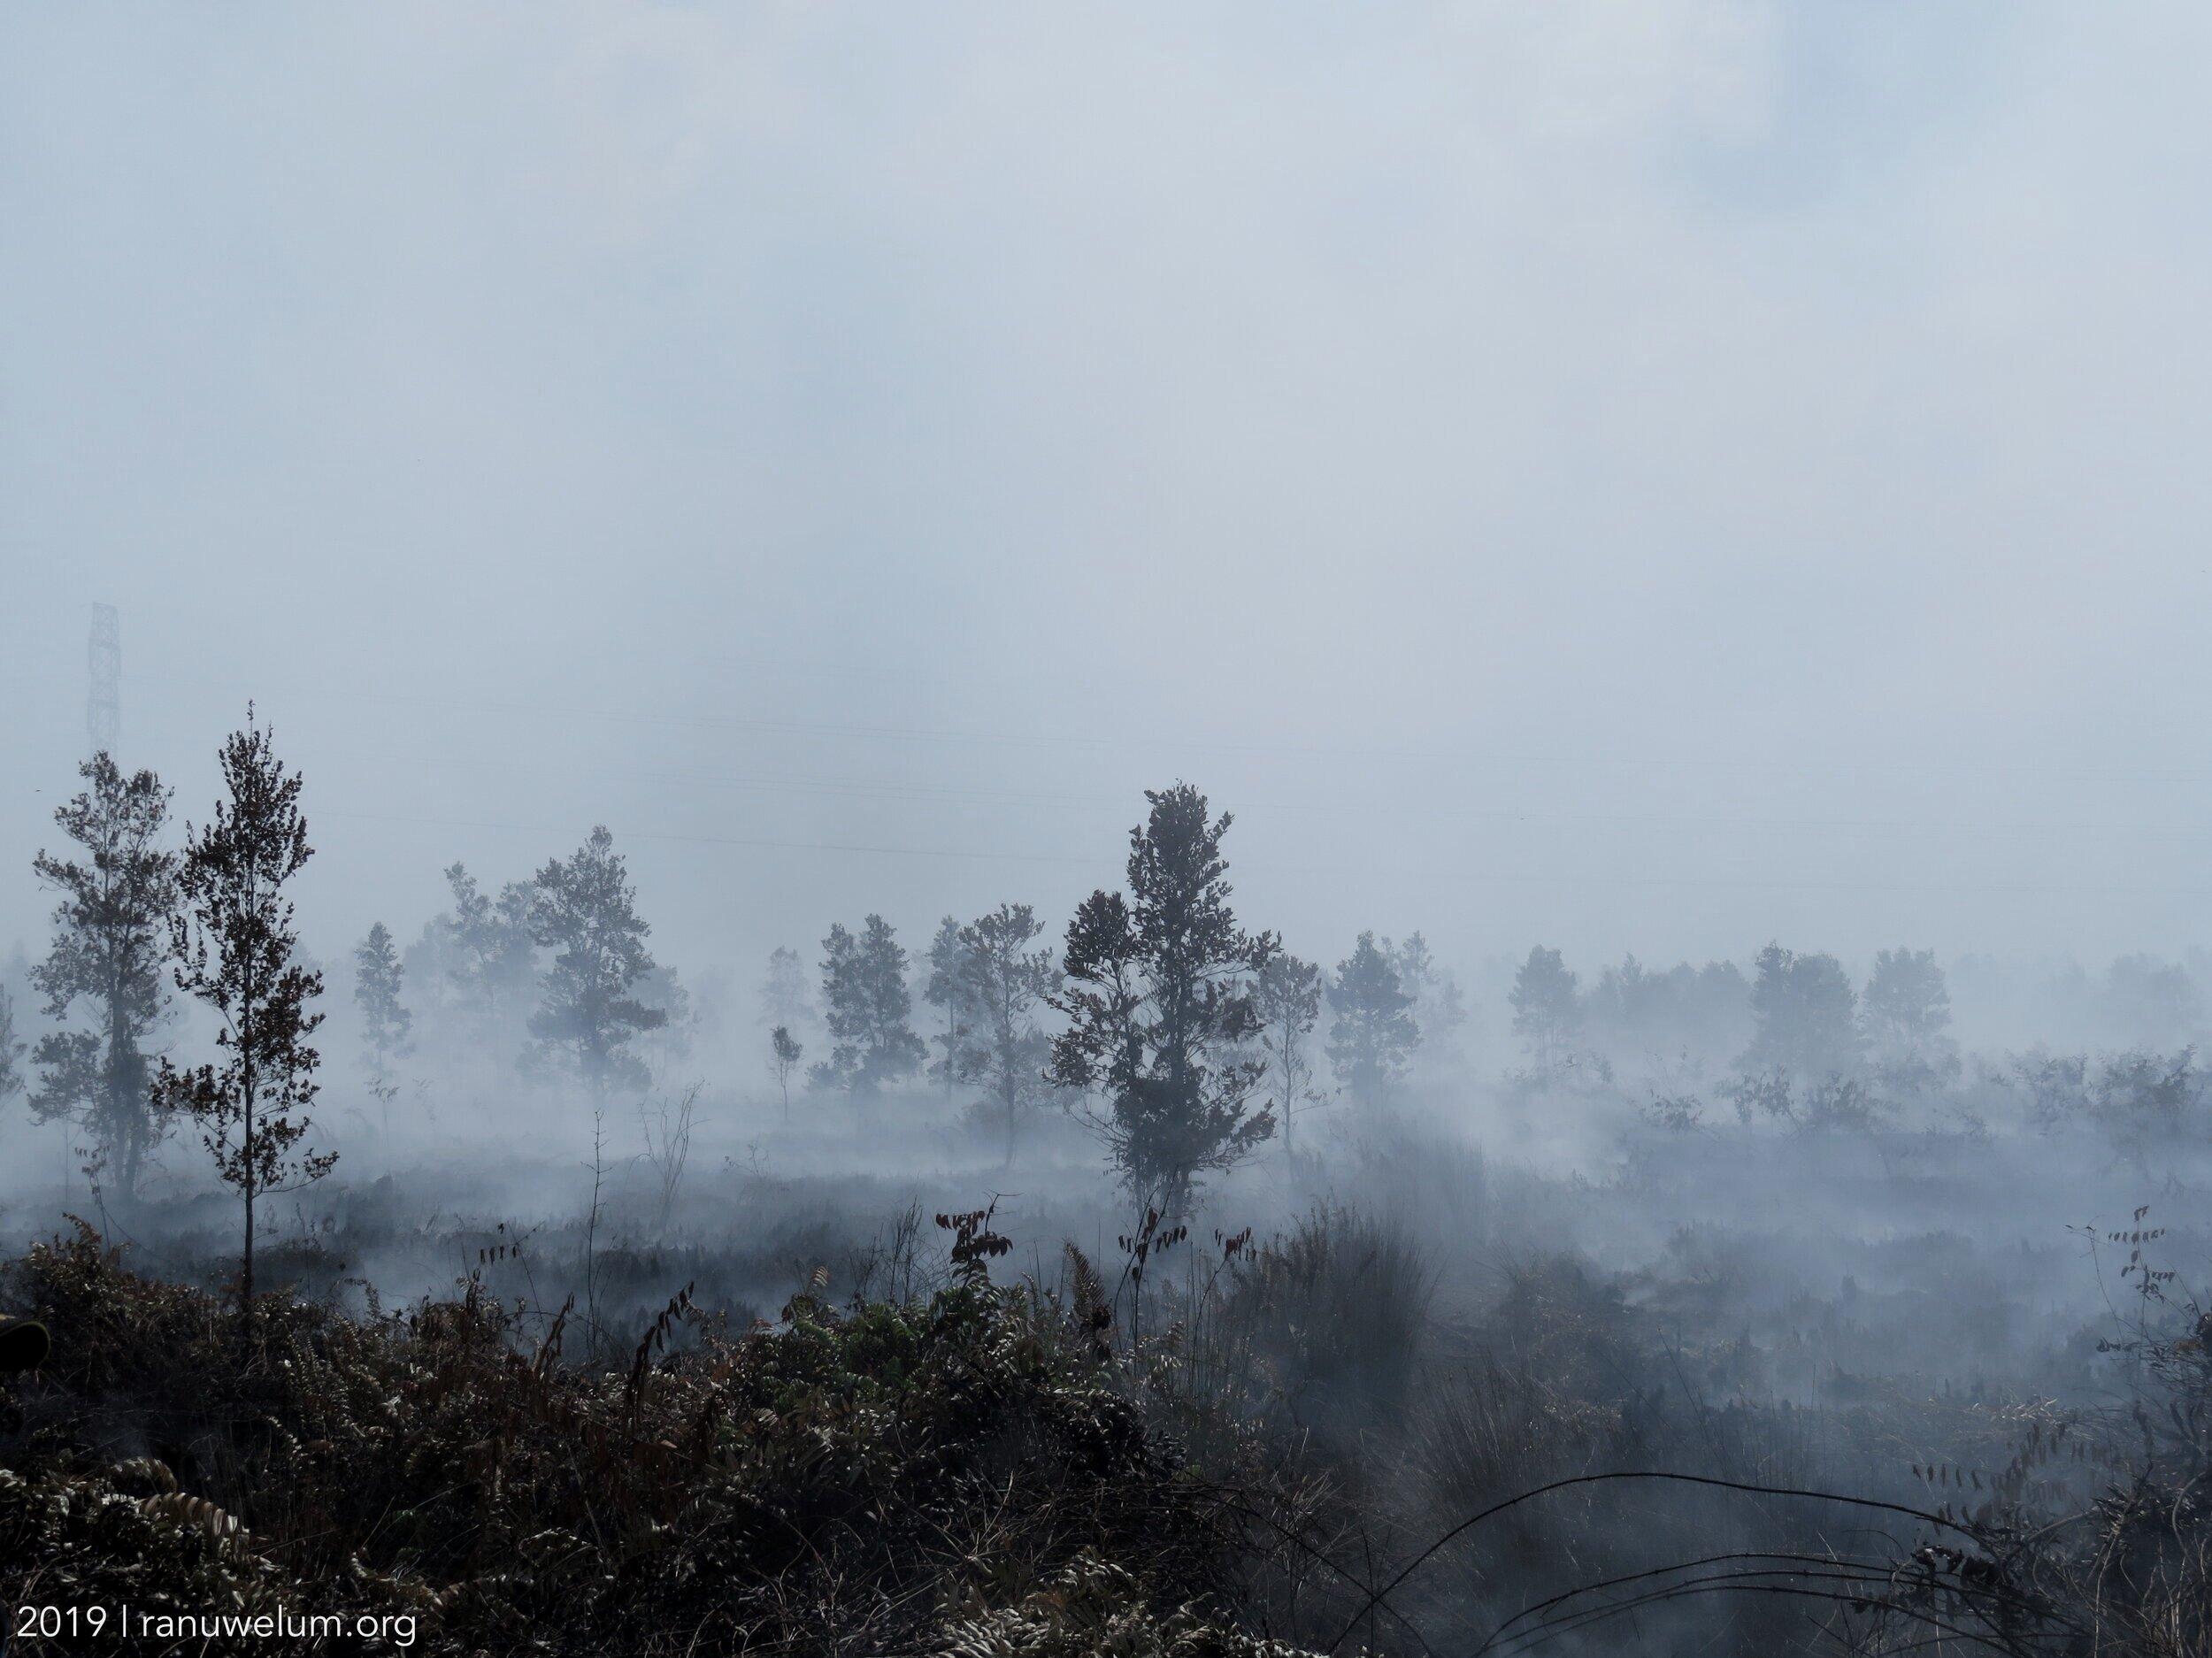 Deep peatland fires resulting in thick smoke haze in Palangkaraya.